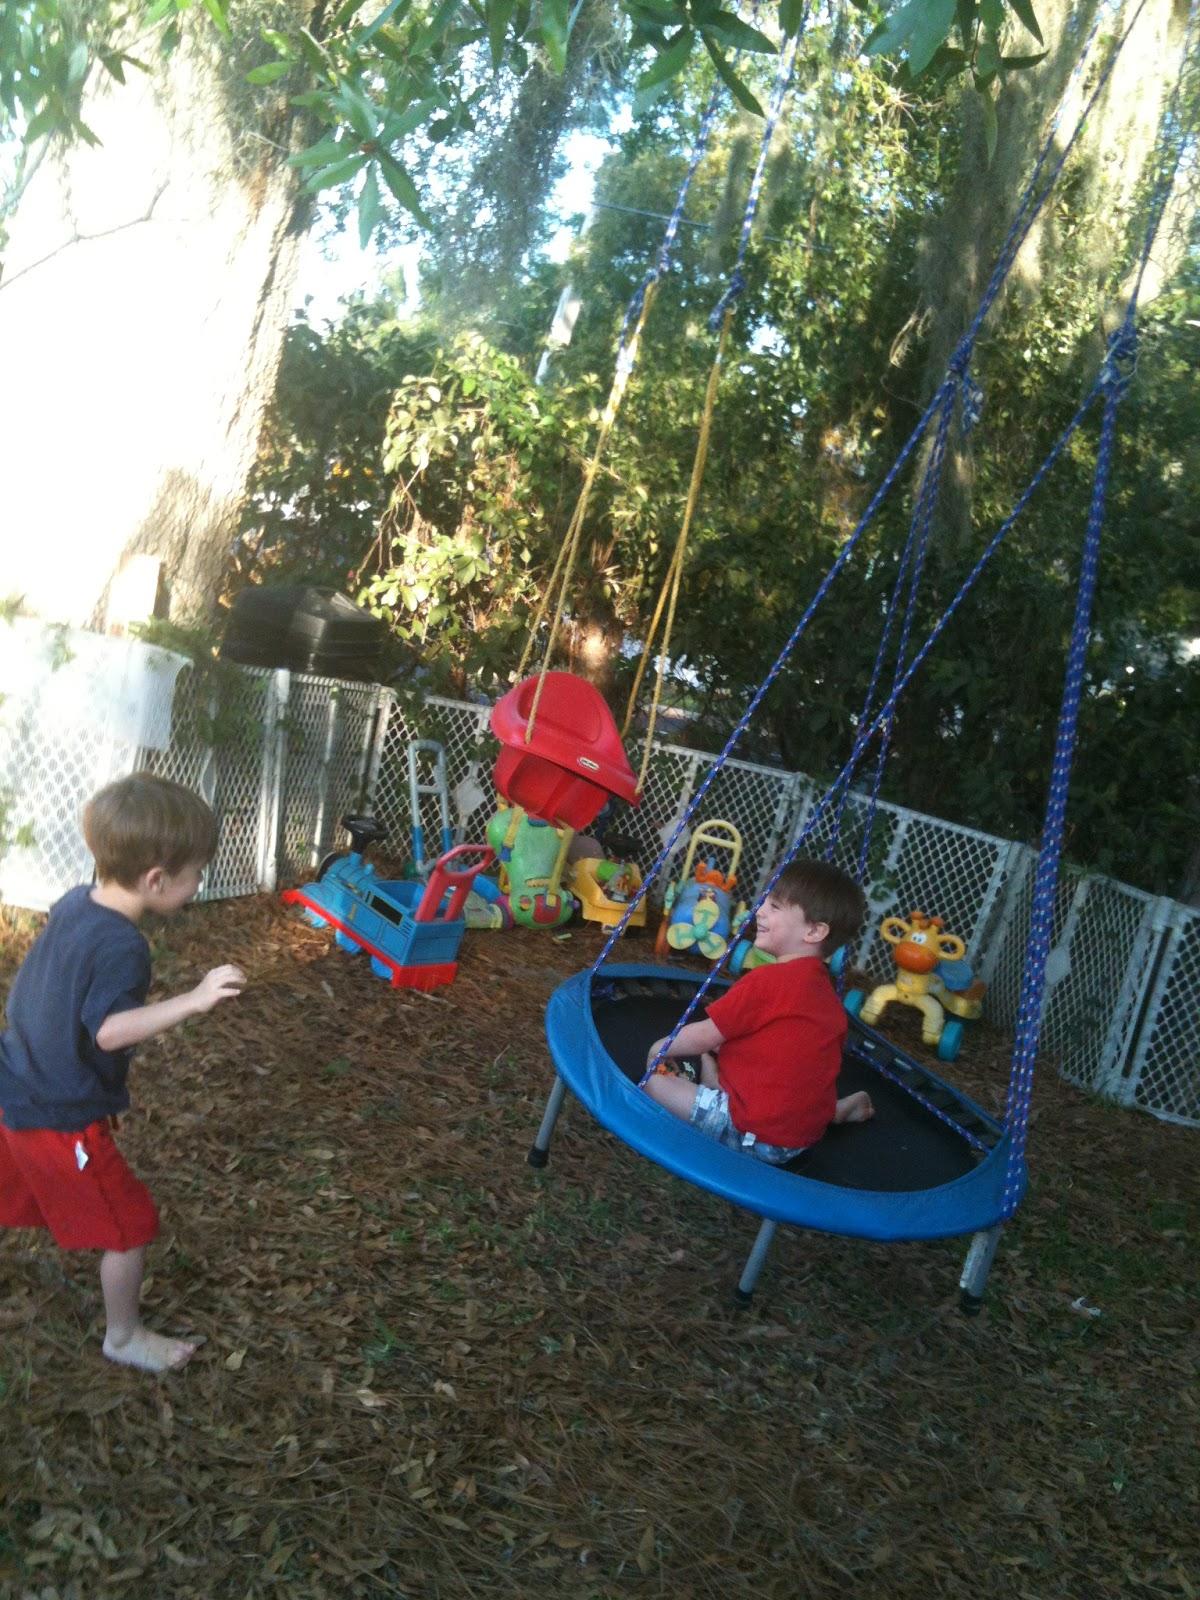 Trampo-swing, Tarzan swing & backyard play environment ...